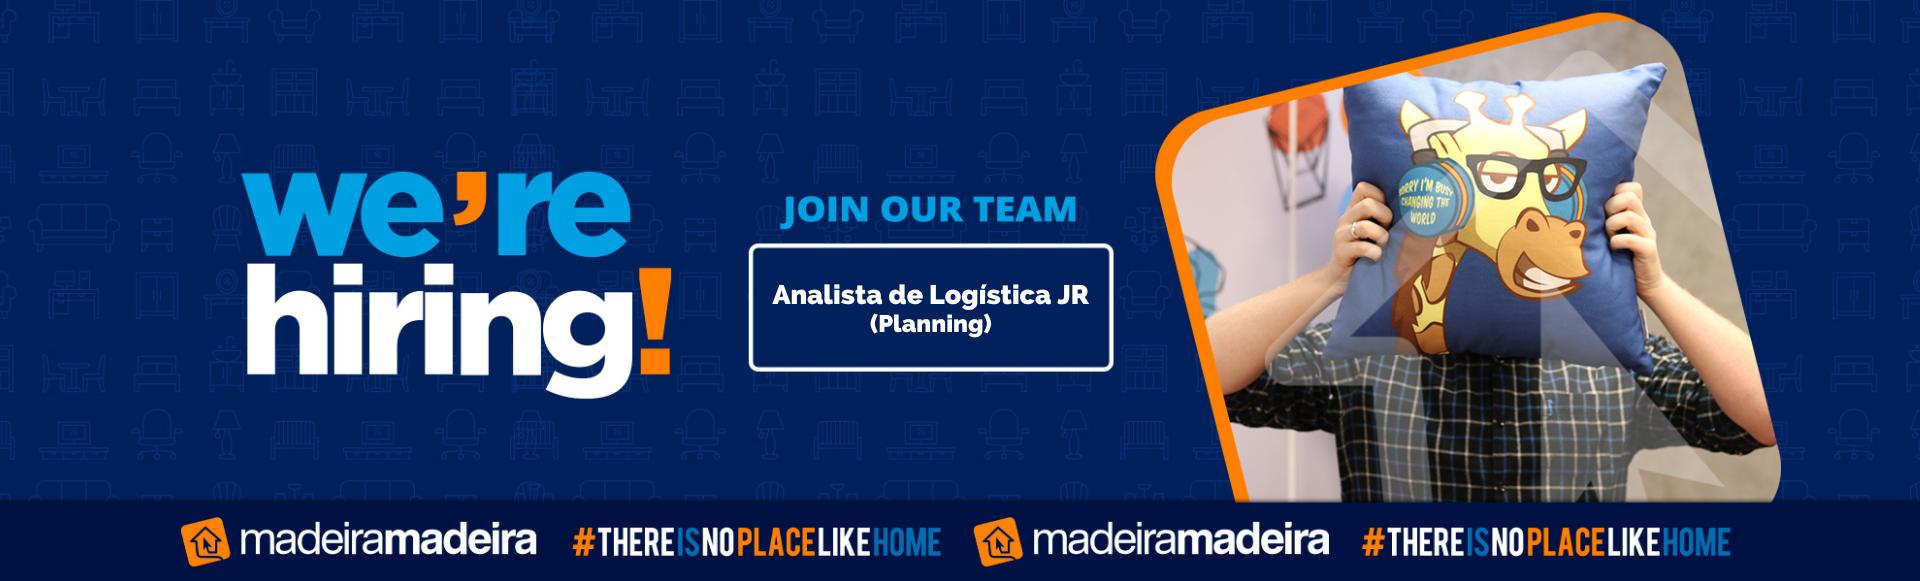 Analista de Logística JR (Planning)